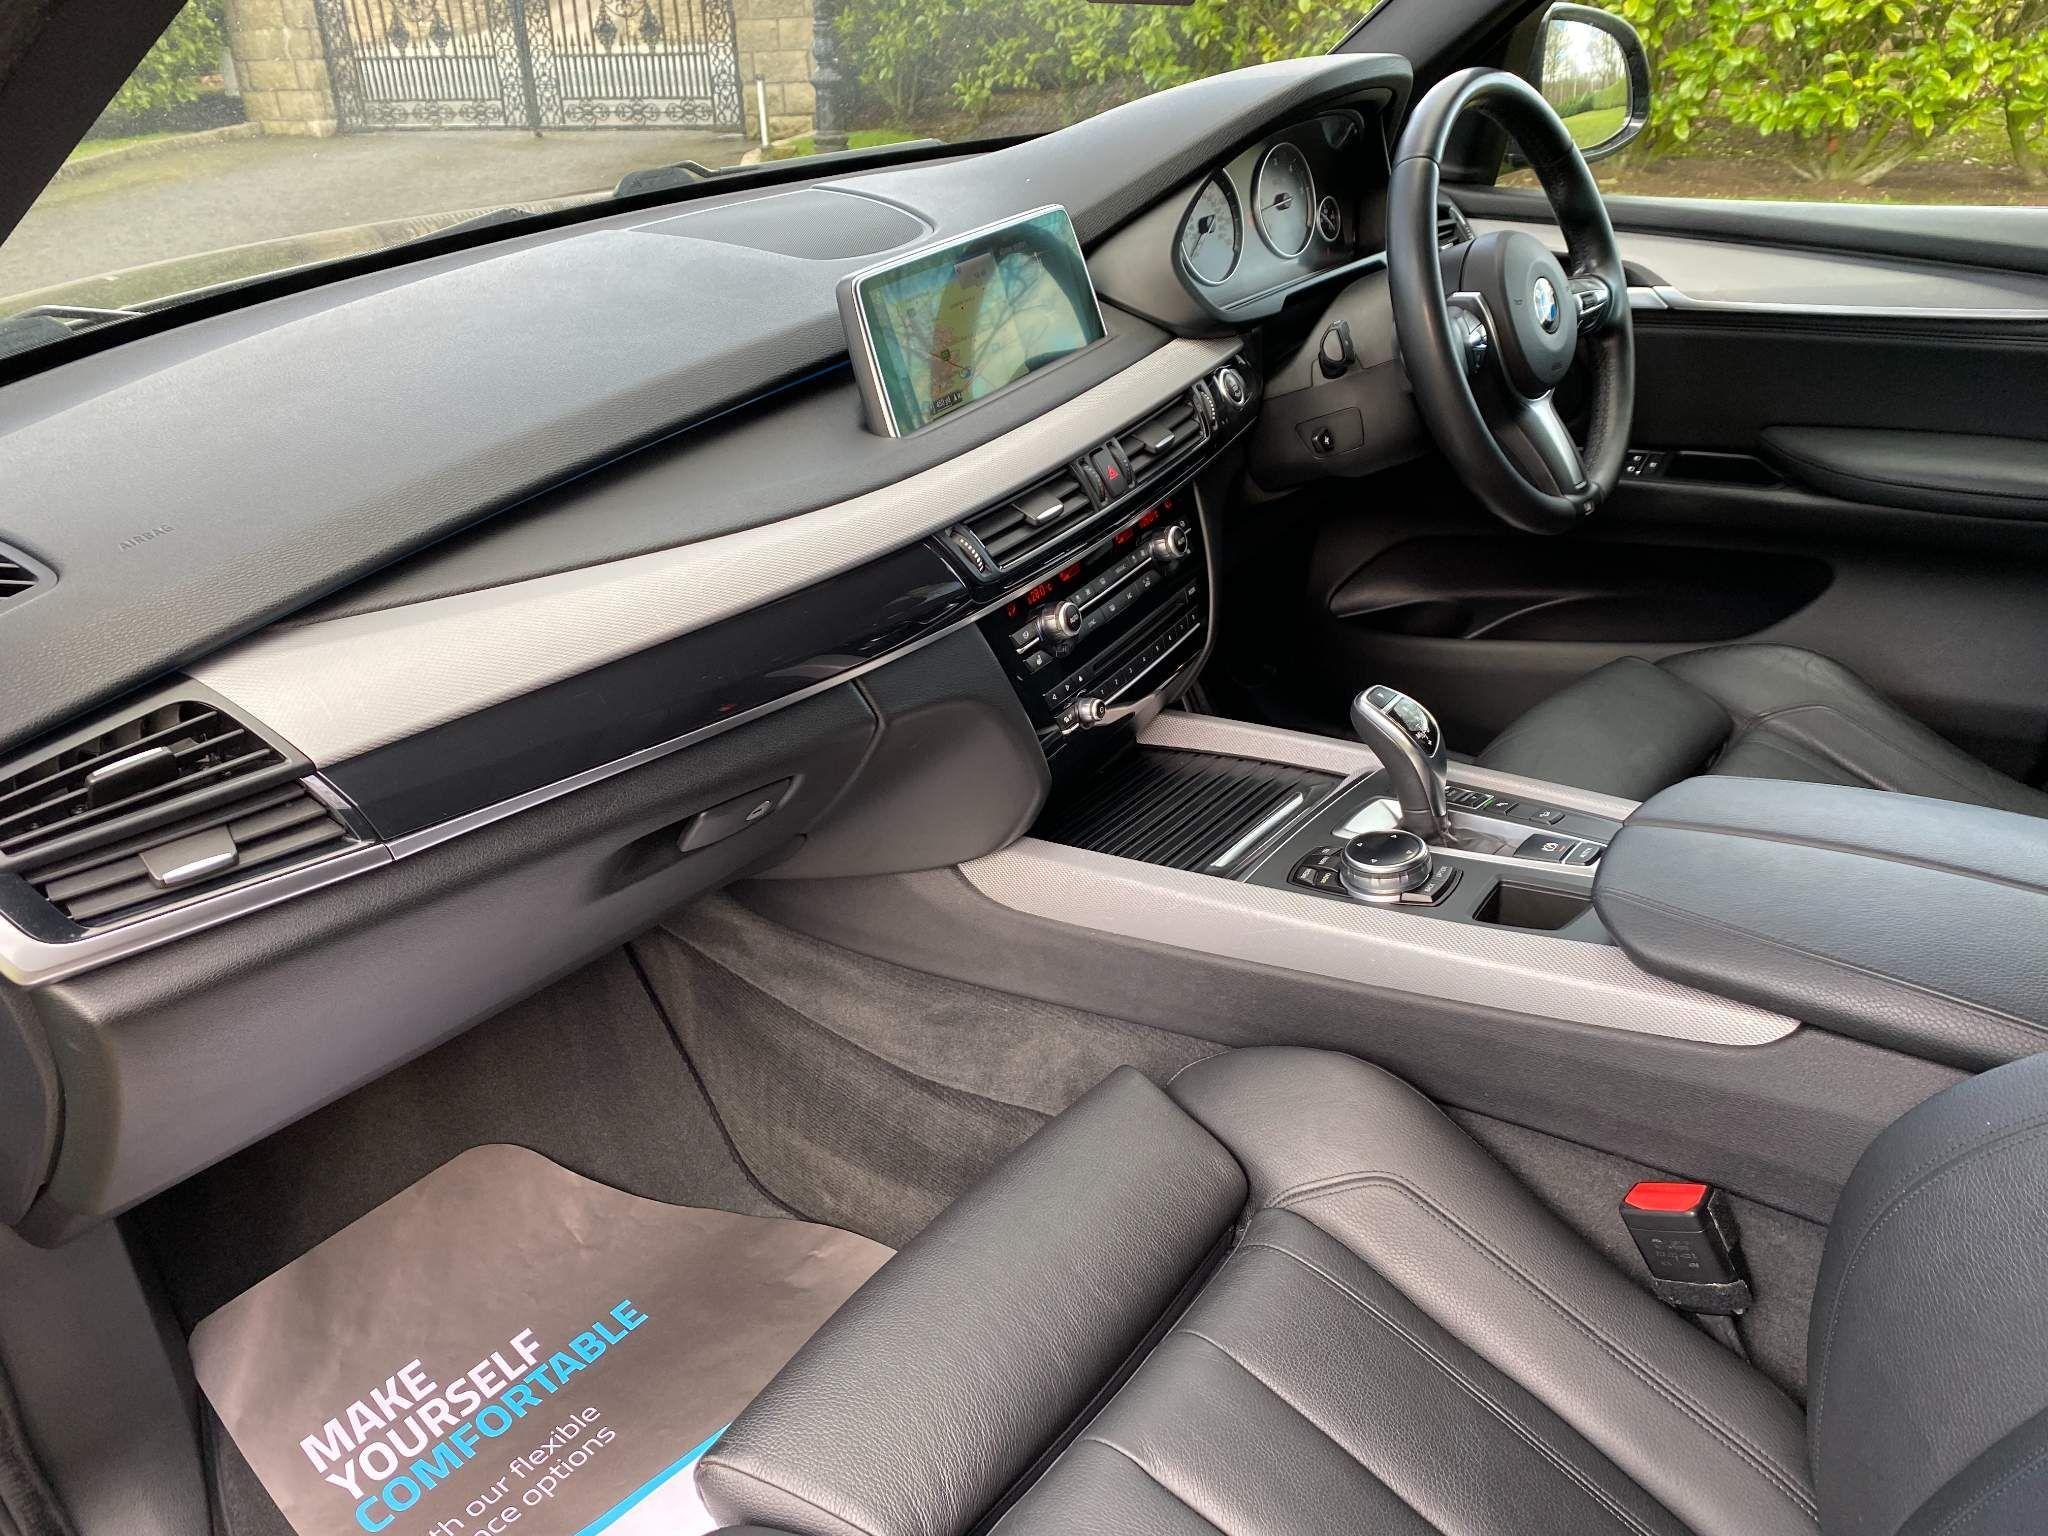 2014 BMW X5 3.0 30d M Sport Auto xDrive (s/s) 5dr Diesel Automatic – Moyway Motors Dungannon full